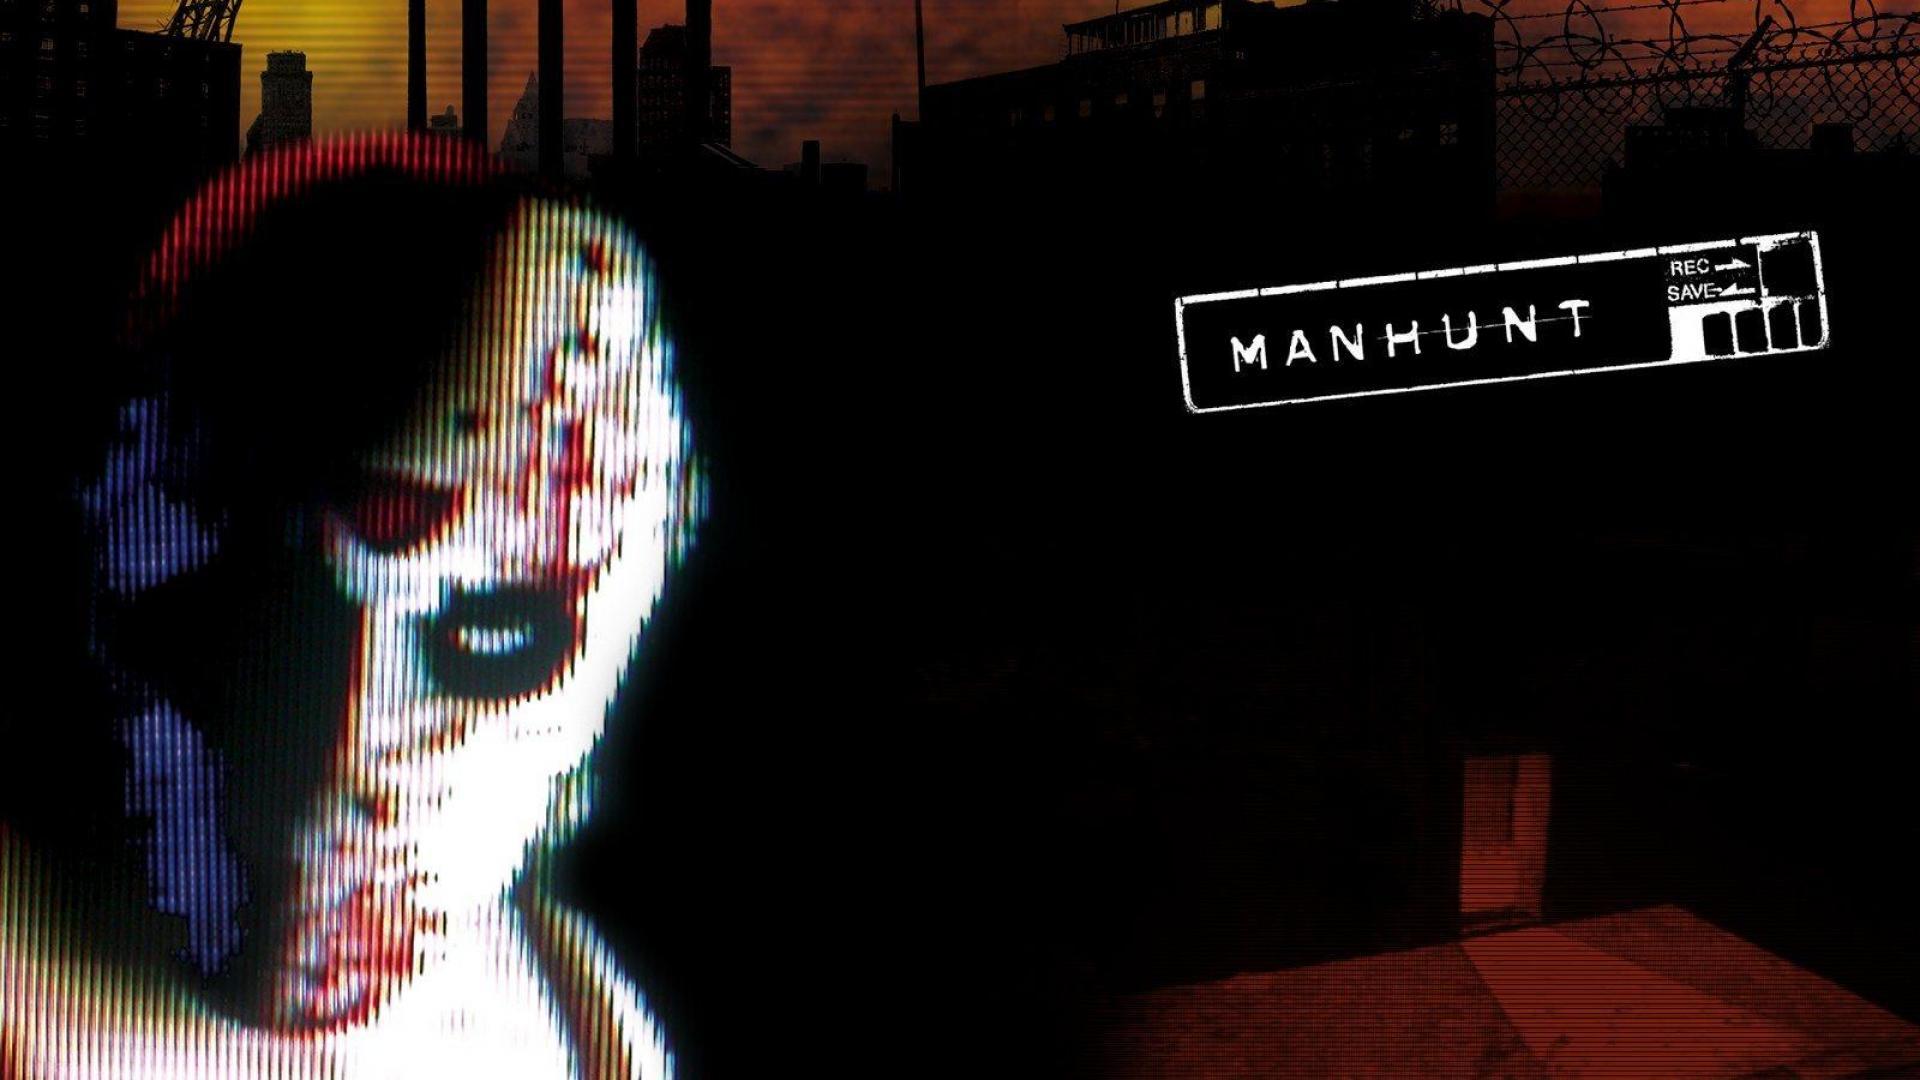 how to run manhunt on windows 10